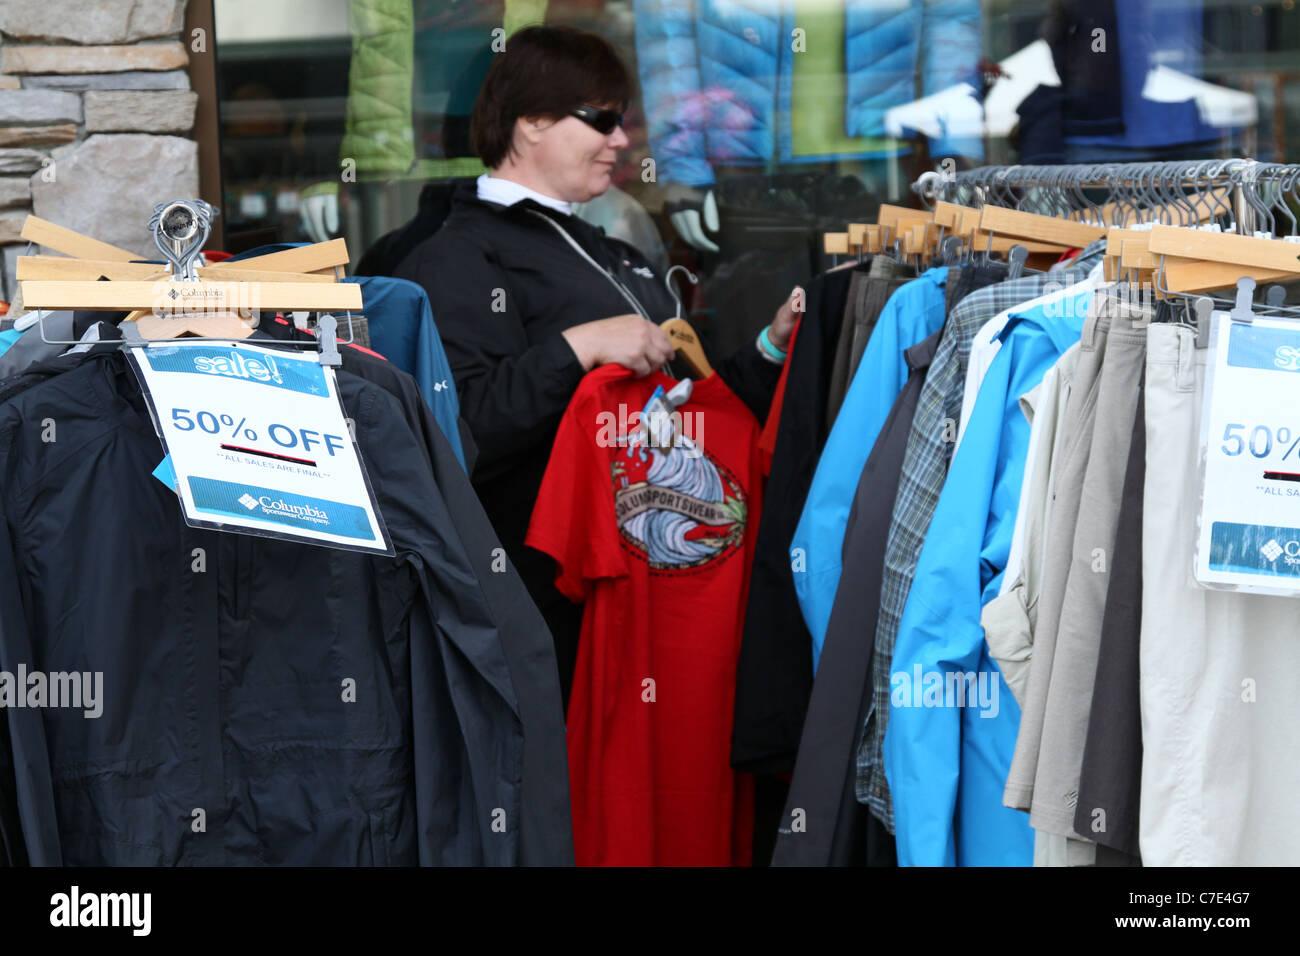 woman apparel clothes sale sales discount rack - Stock Image